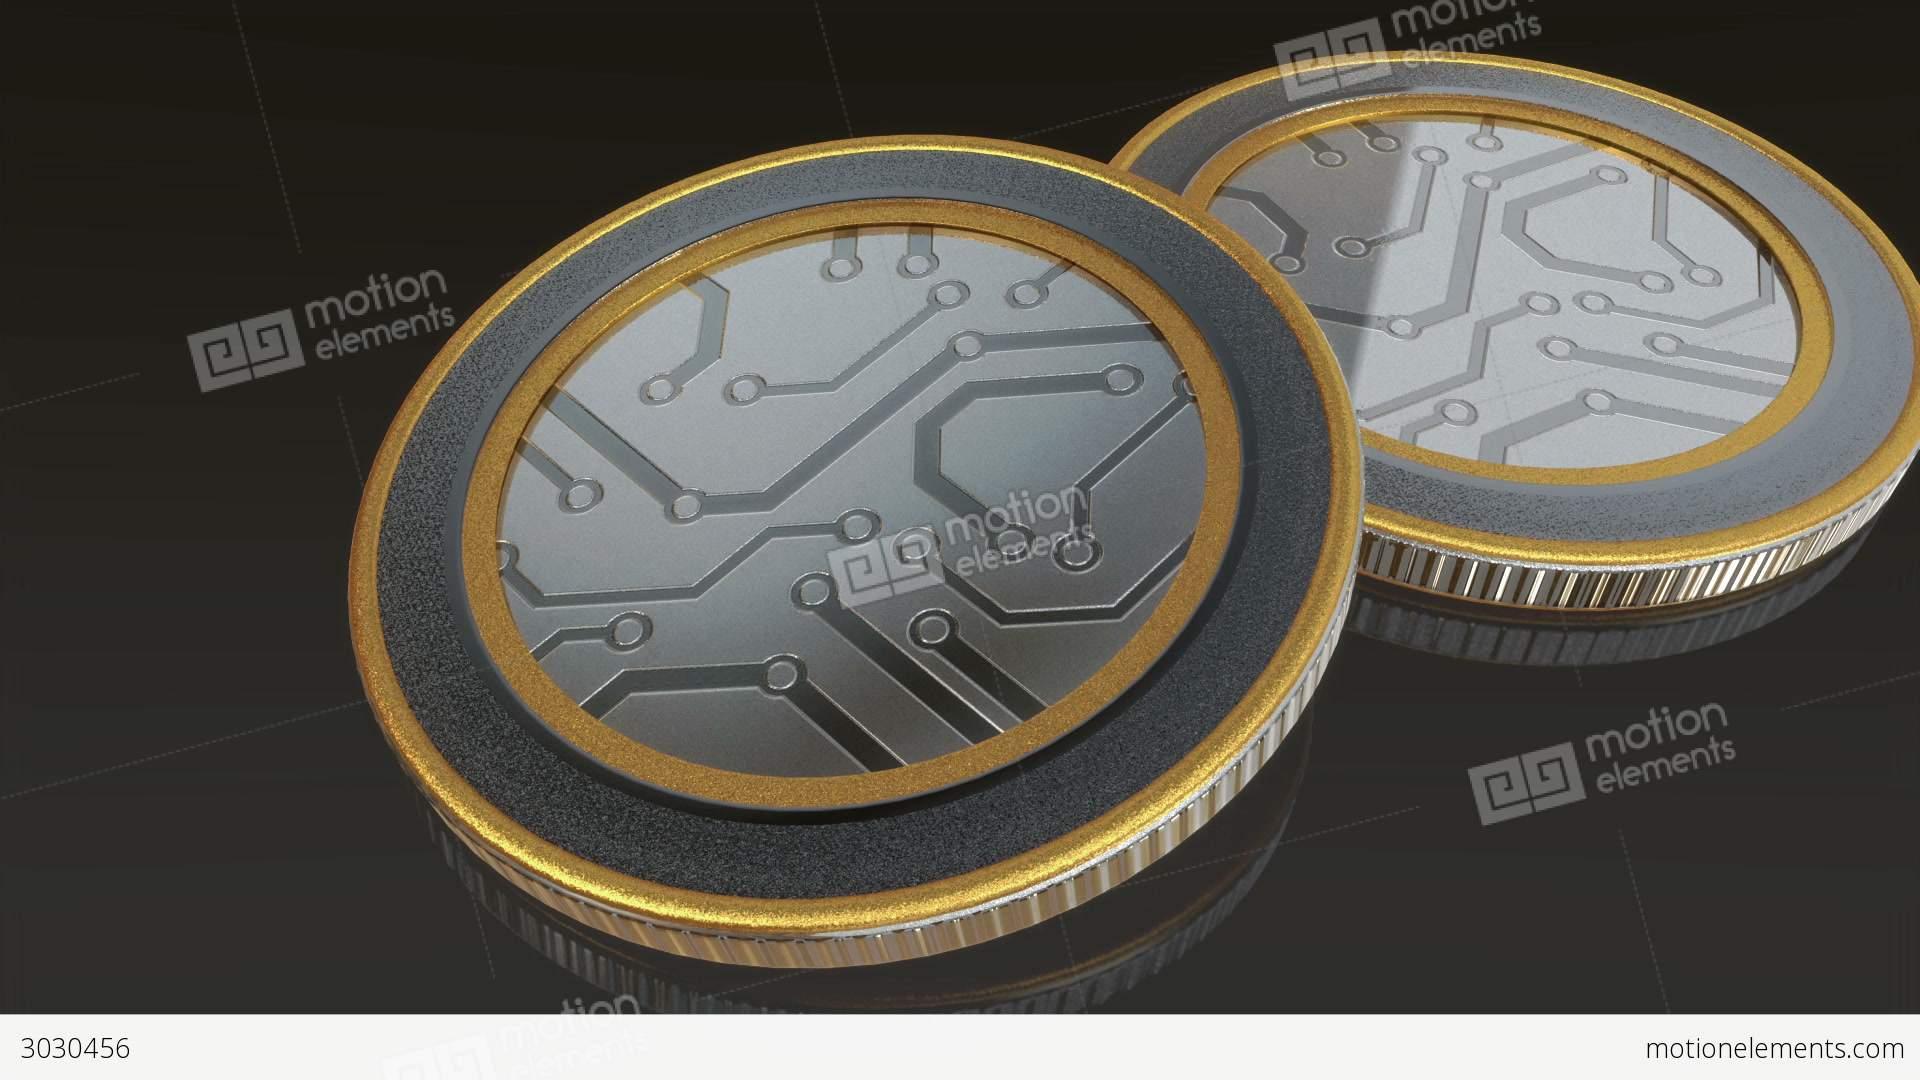 me3030456-digital-coins-pan-hd-a0048.jpg